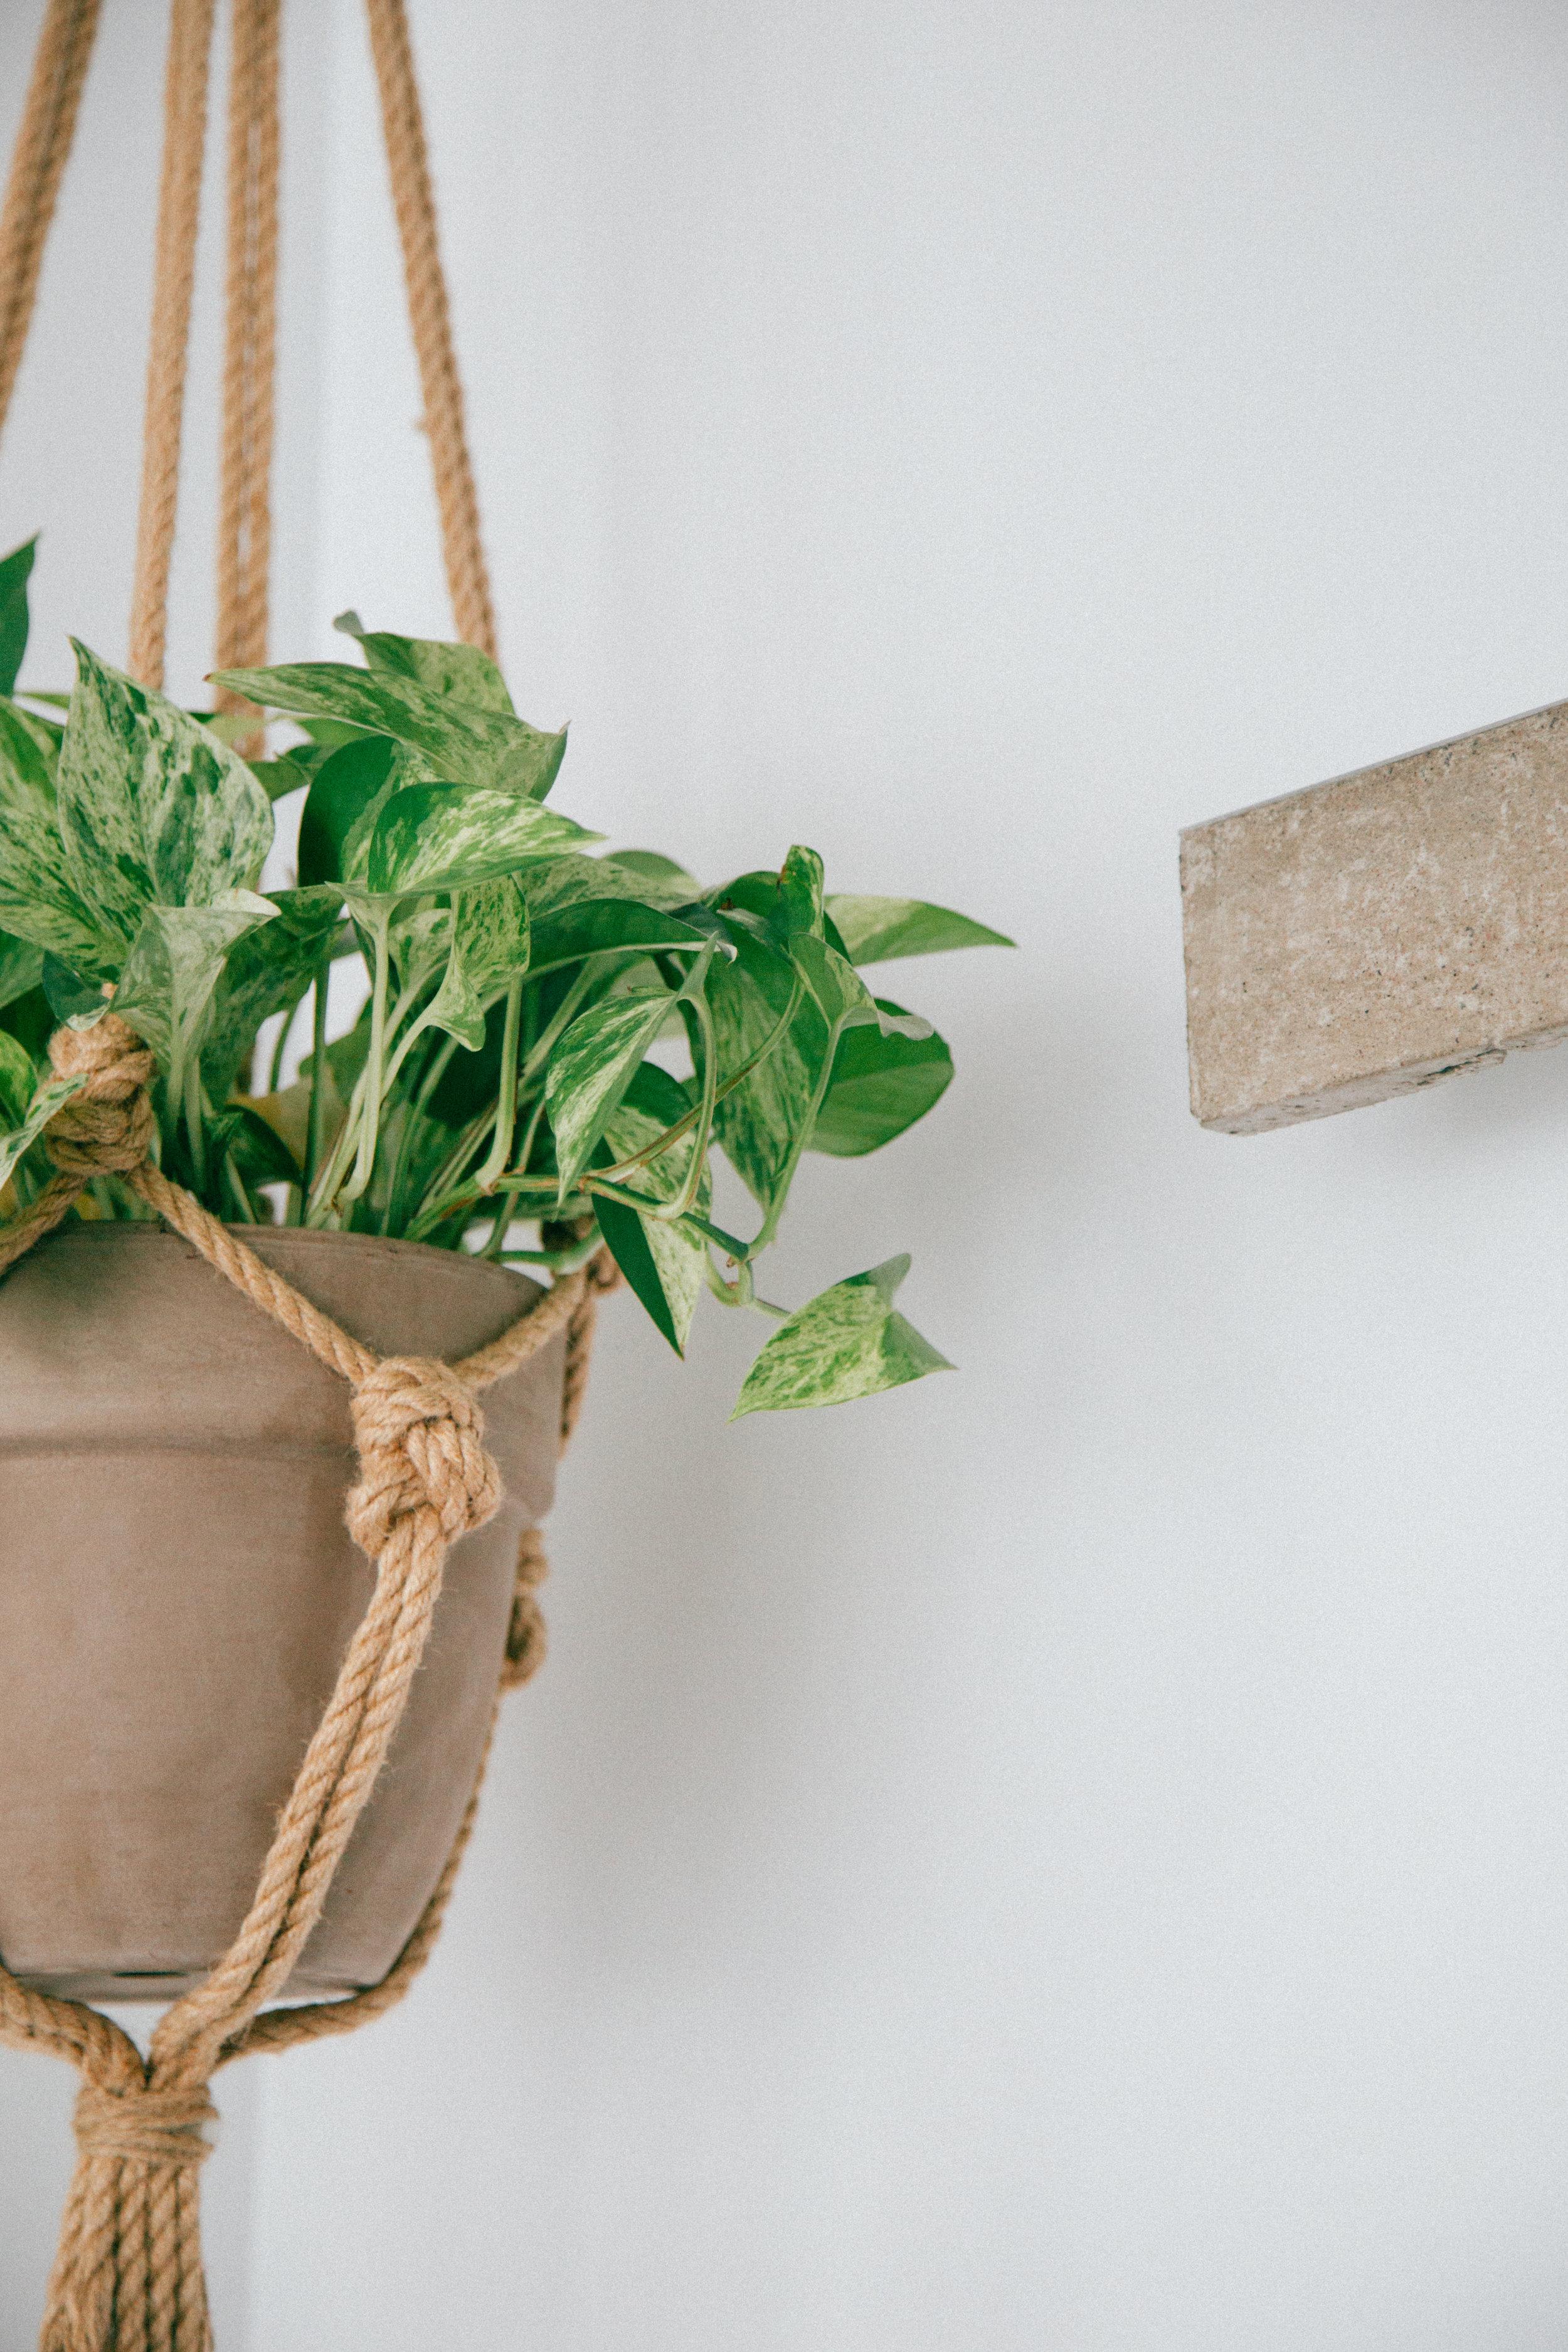 Hanging Planters - Garden Maintenance